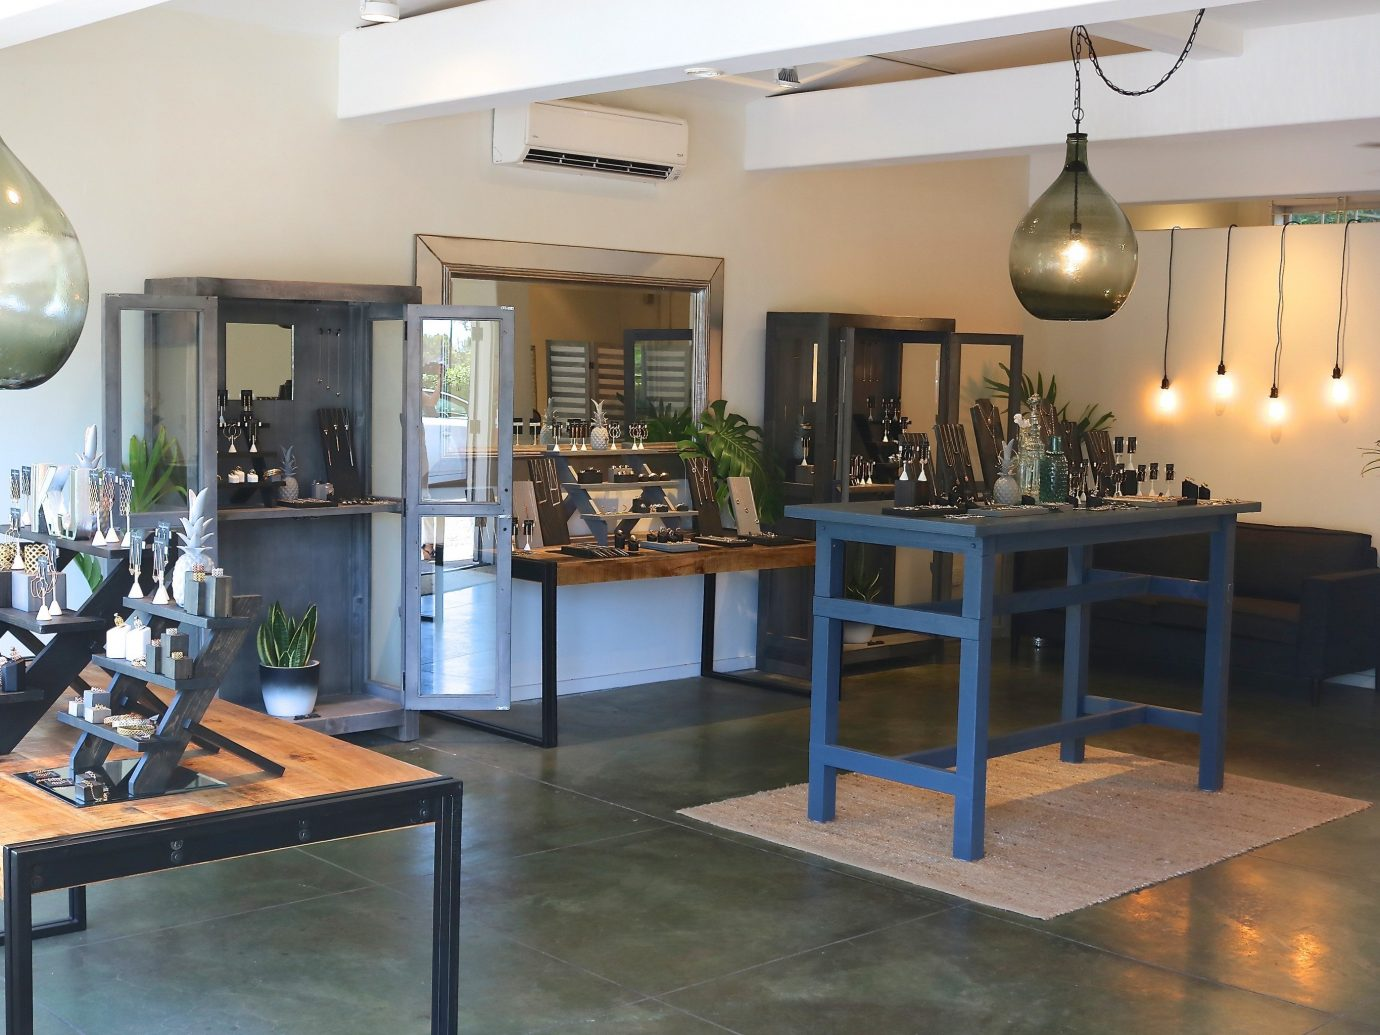 Trip Ideas indoor table floor room Living interior design real estate flooring furniture area Island